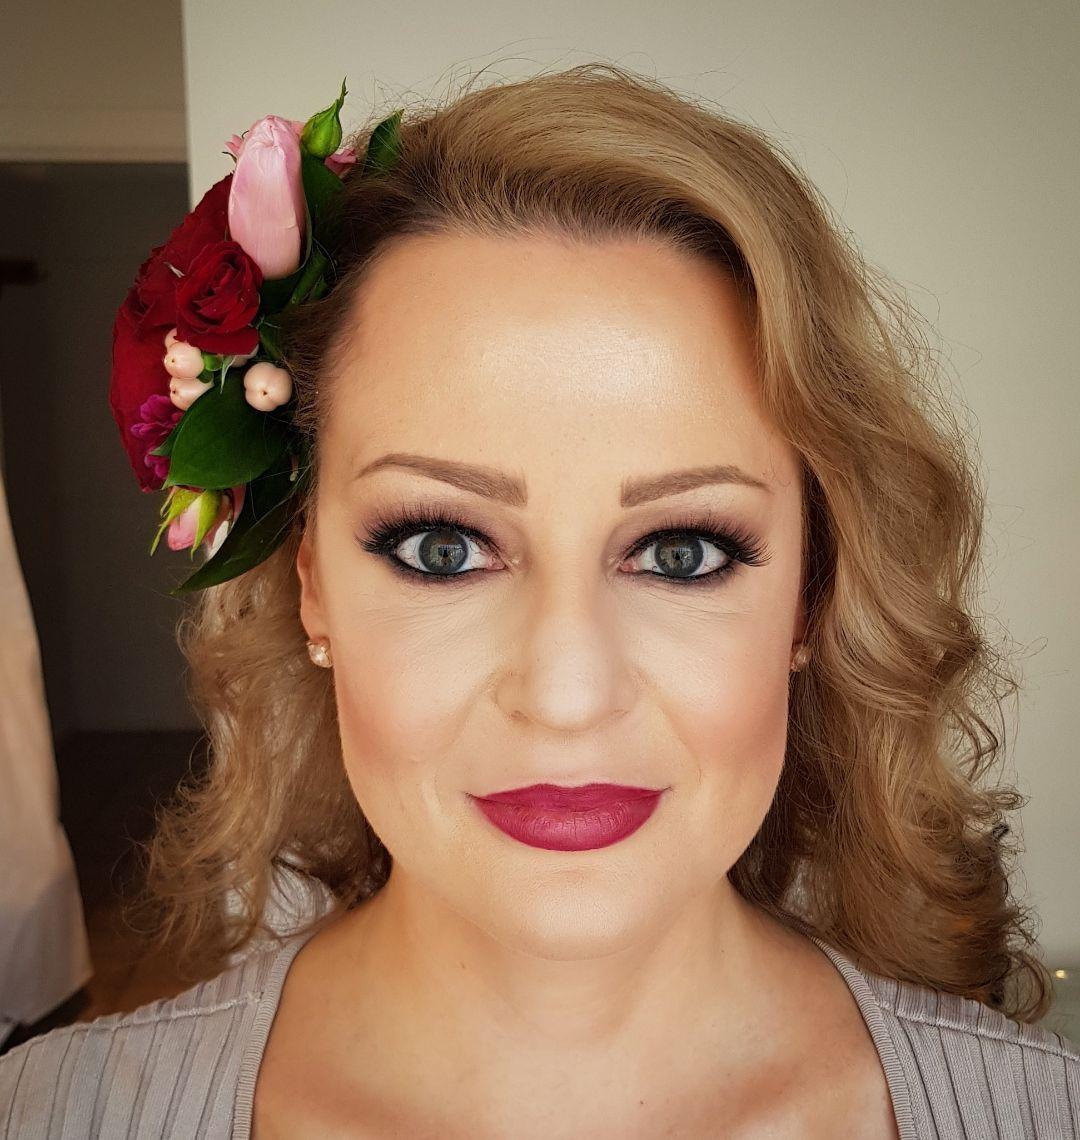 Beauty makeup hairdresser melbourne mobile hair stylist